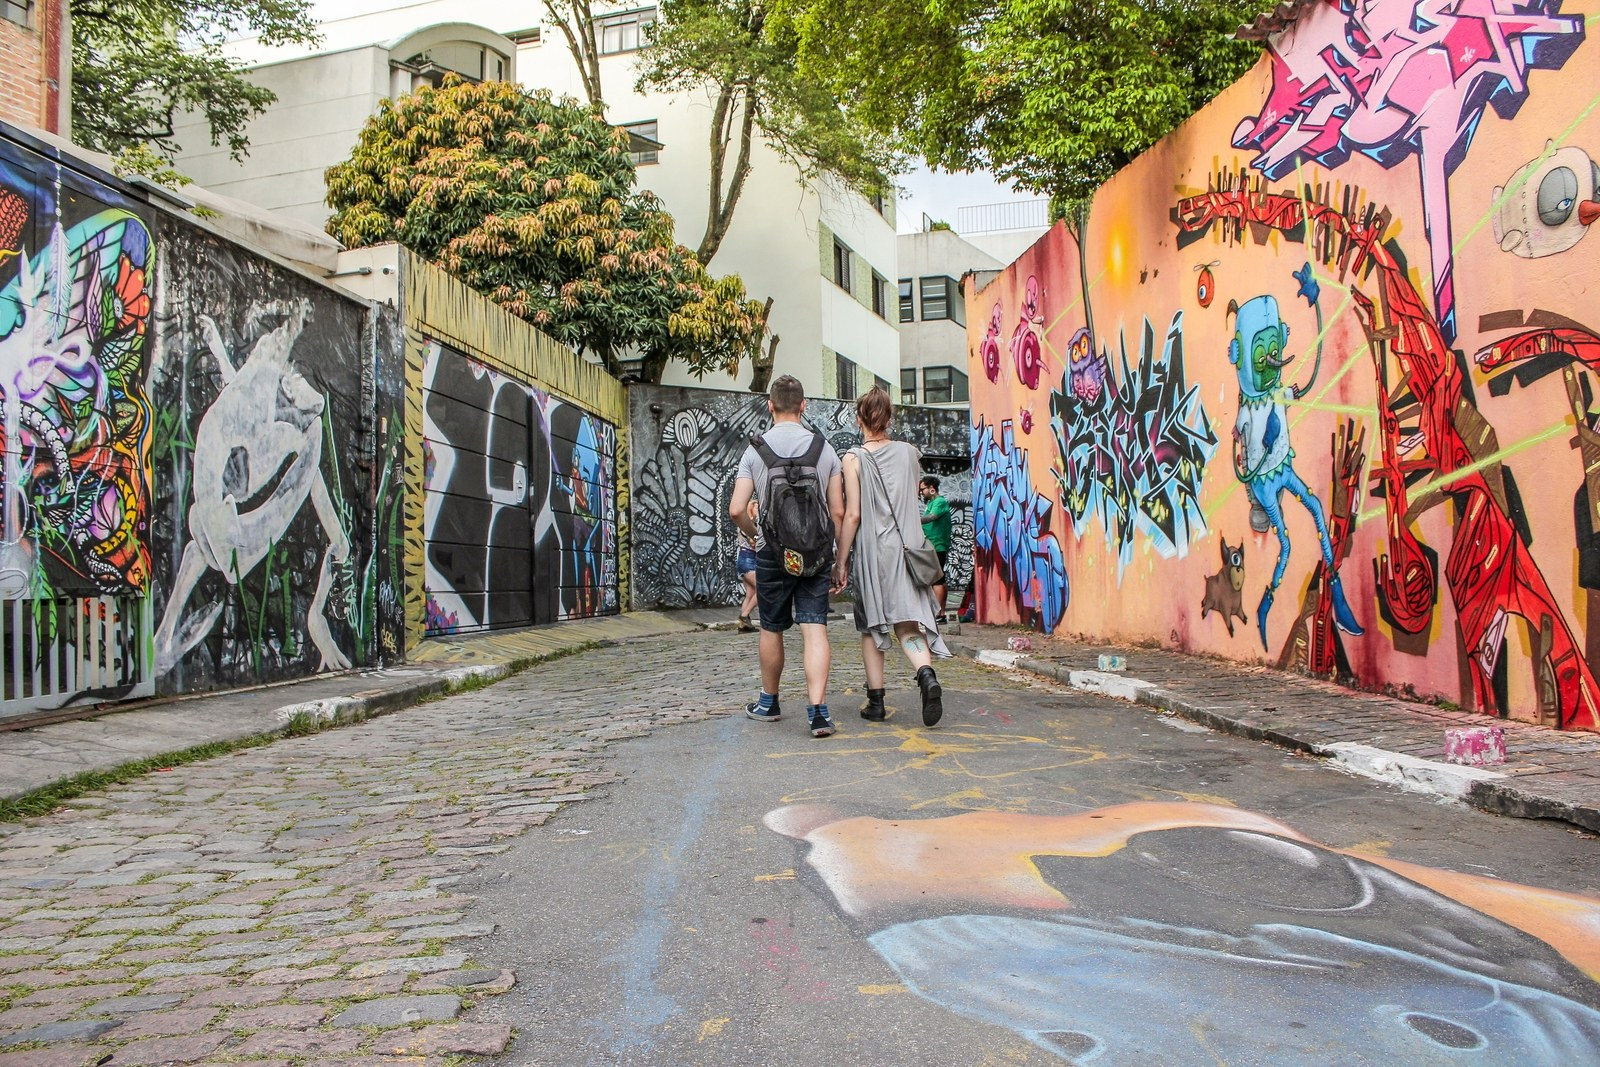 The Batman's Alley in Vila Madalena